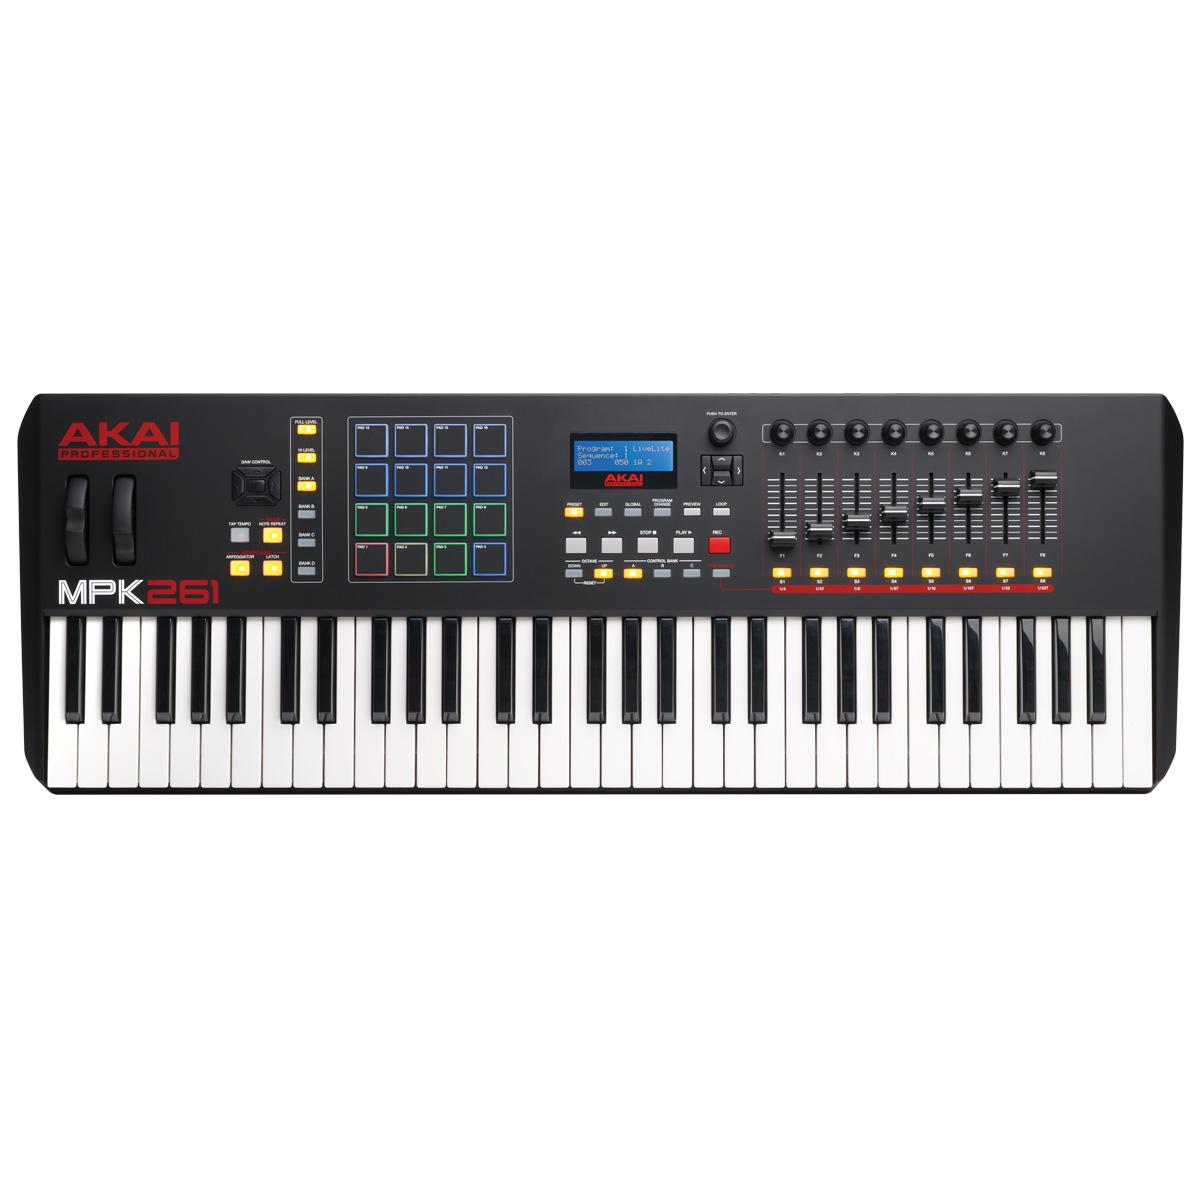 Teclado Controlador MIDI / USB MPK 261 - AKAI